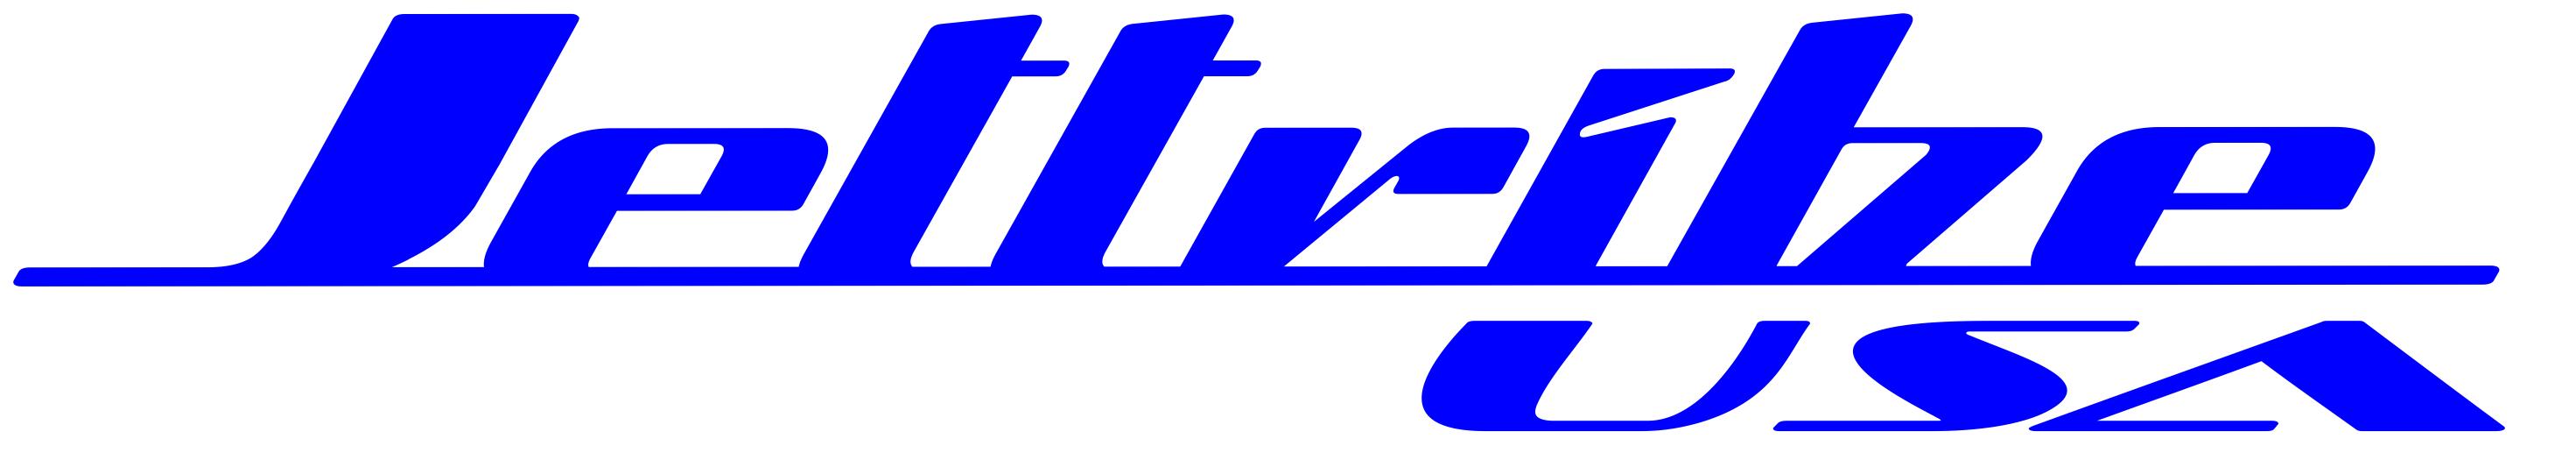 jettribe-usa-v2.png